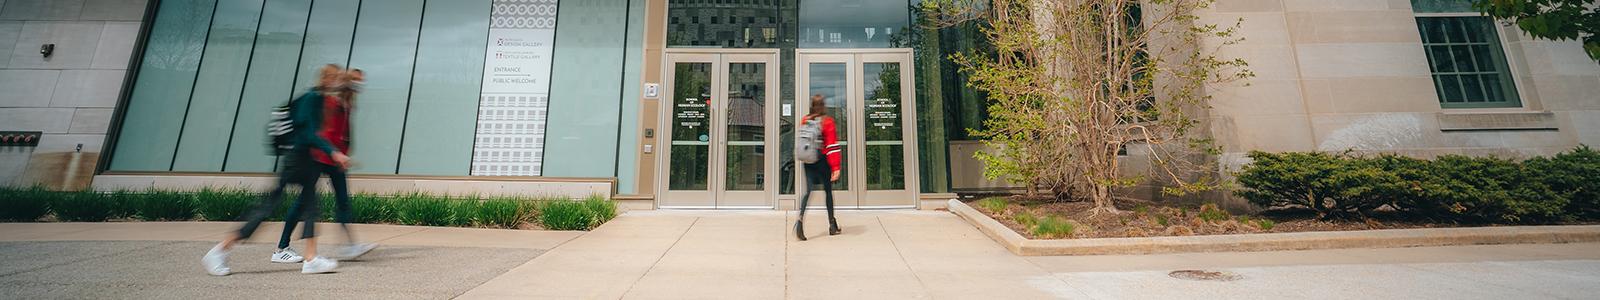 Students enter the Nancy Nicholas Hall School of Human Ecology building